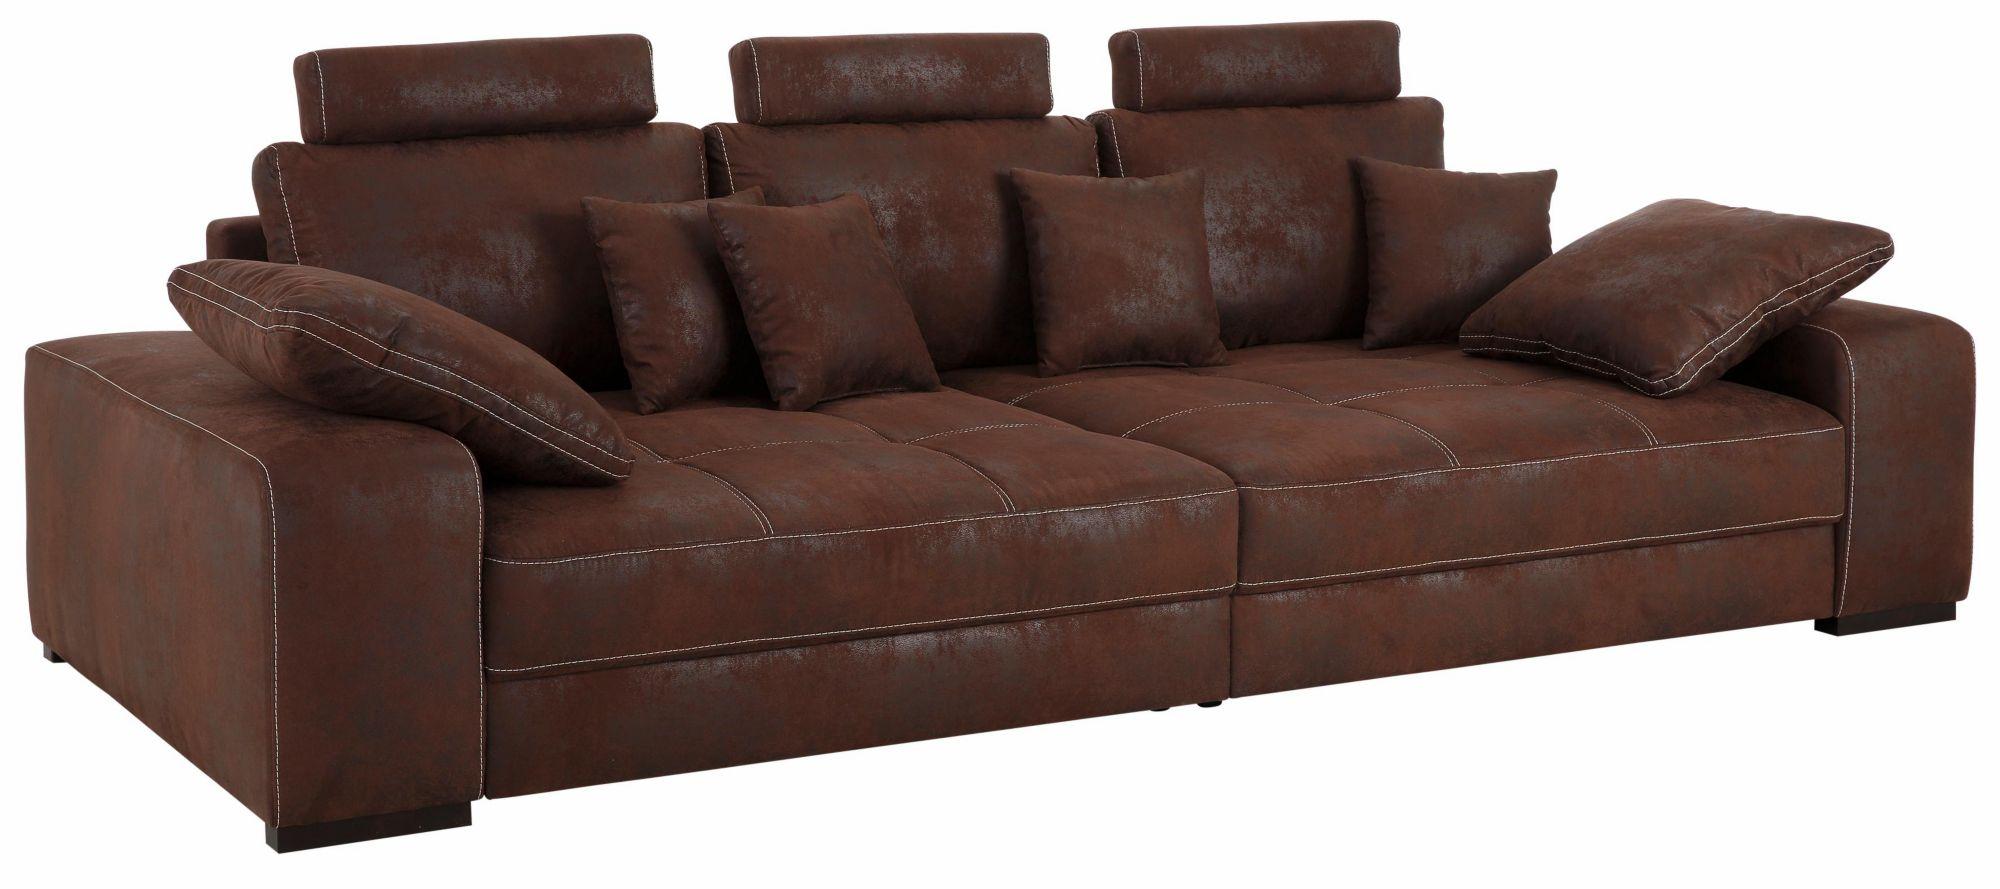 Premium collection by home affaire big sofa mit boxspringfederung diabolo schwab versand Sofa primabelle